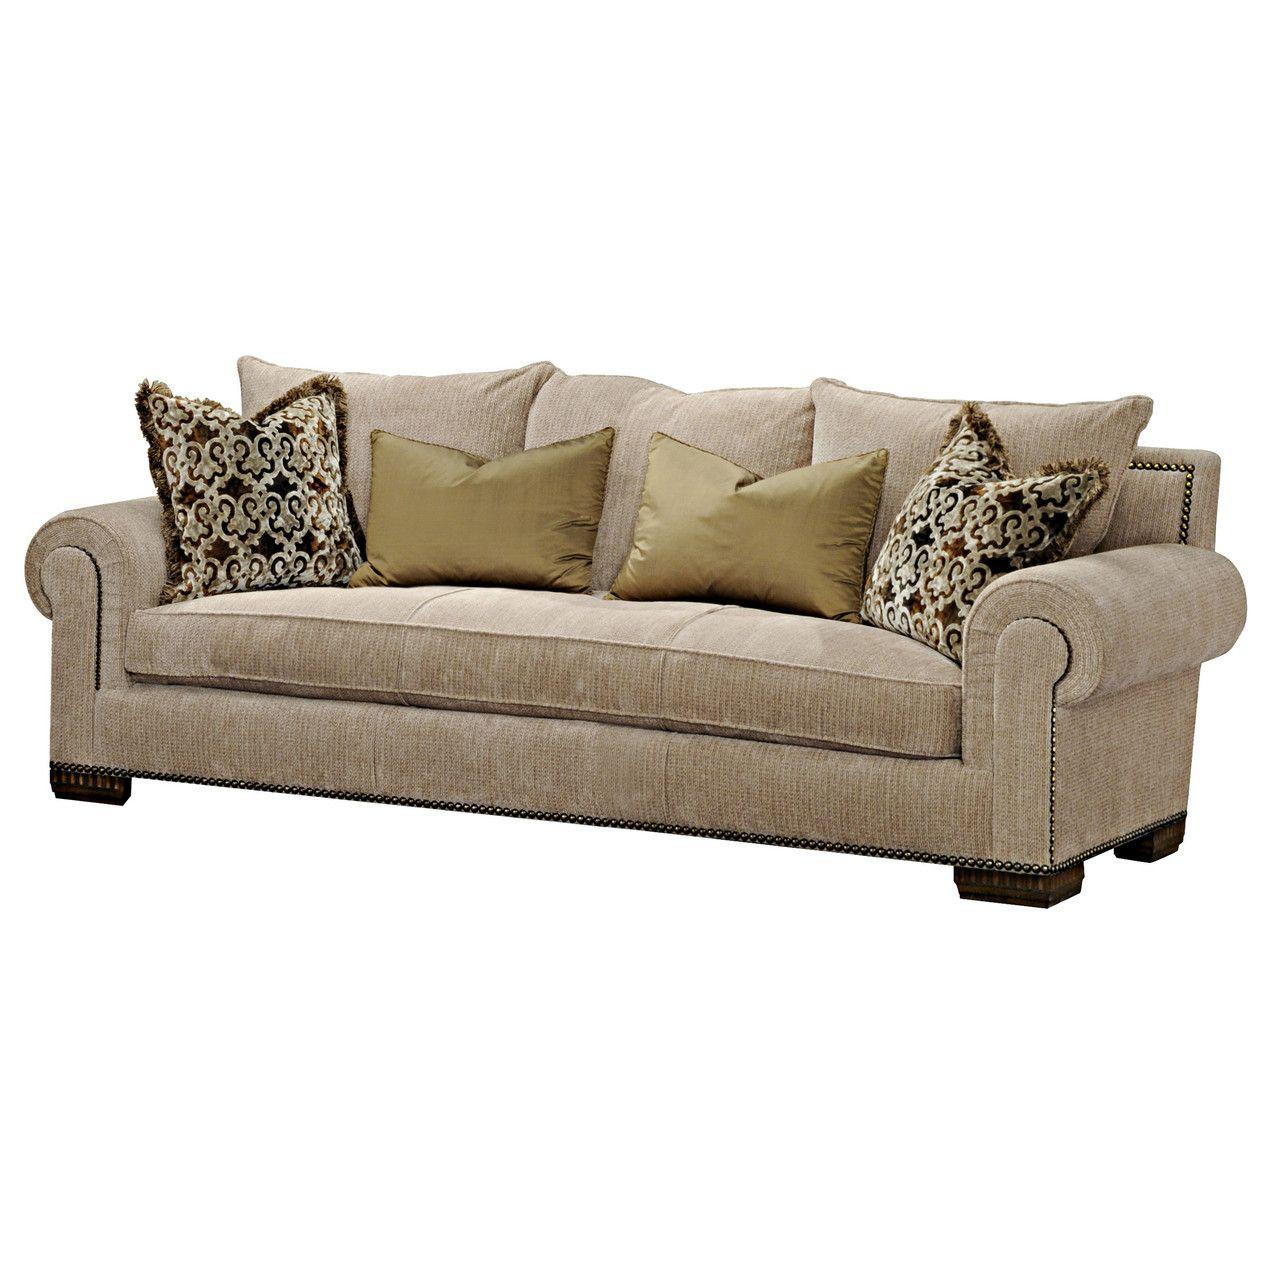 Marge Carson Bedroom Furniture Bentley Sofa Marge Carson Furniture Toms Price Furniture